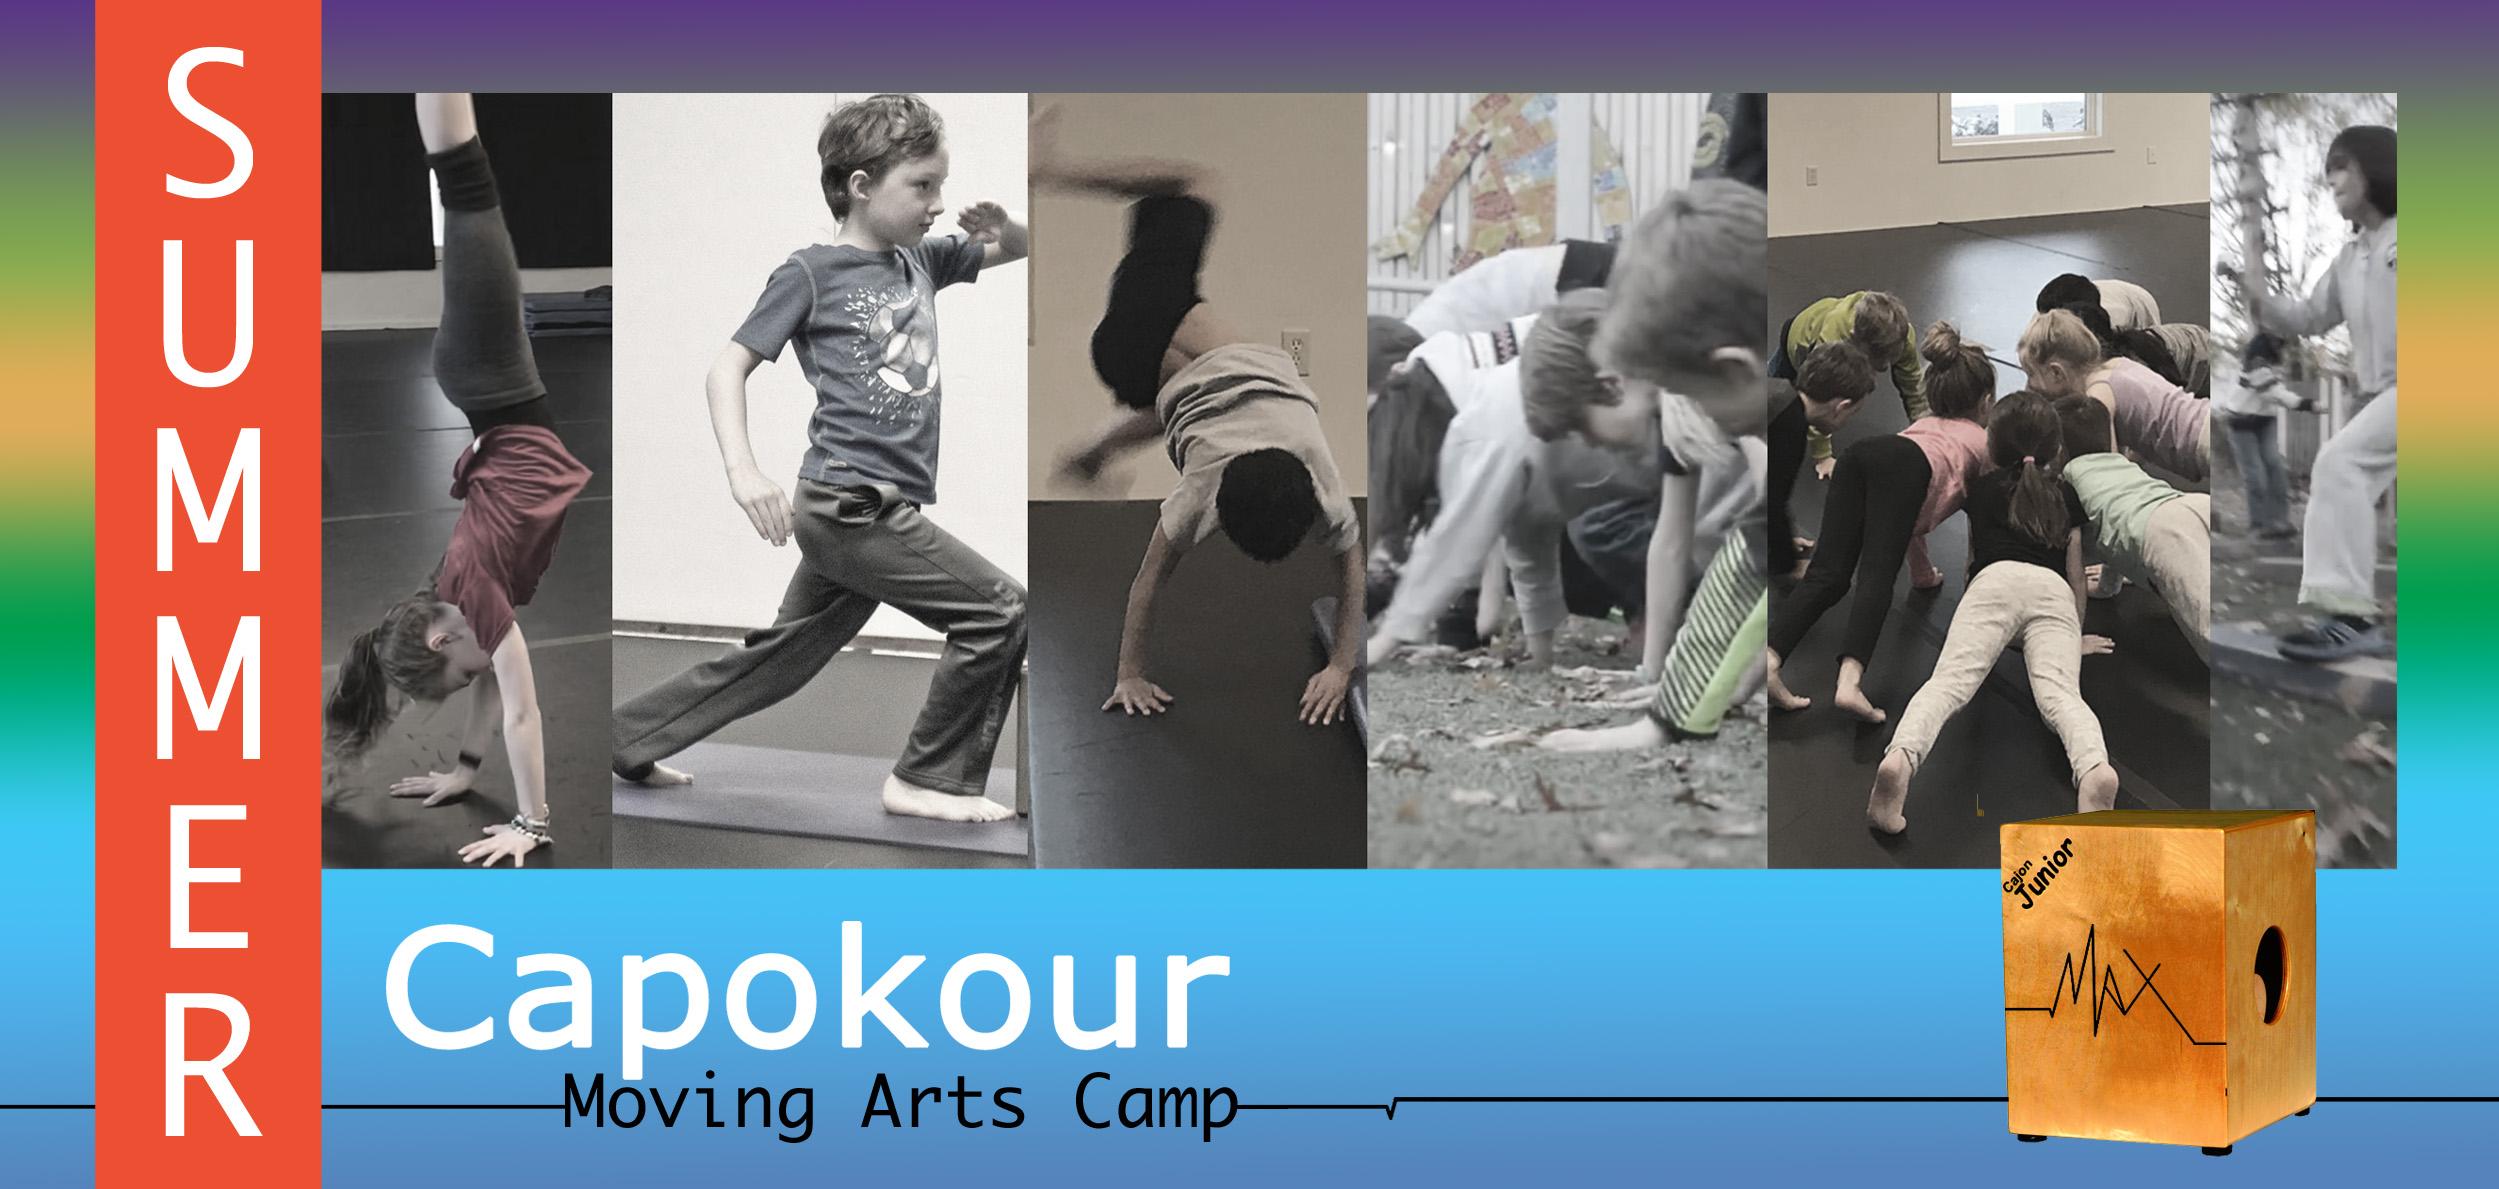 Capokour Moving Arts Camp.jpg